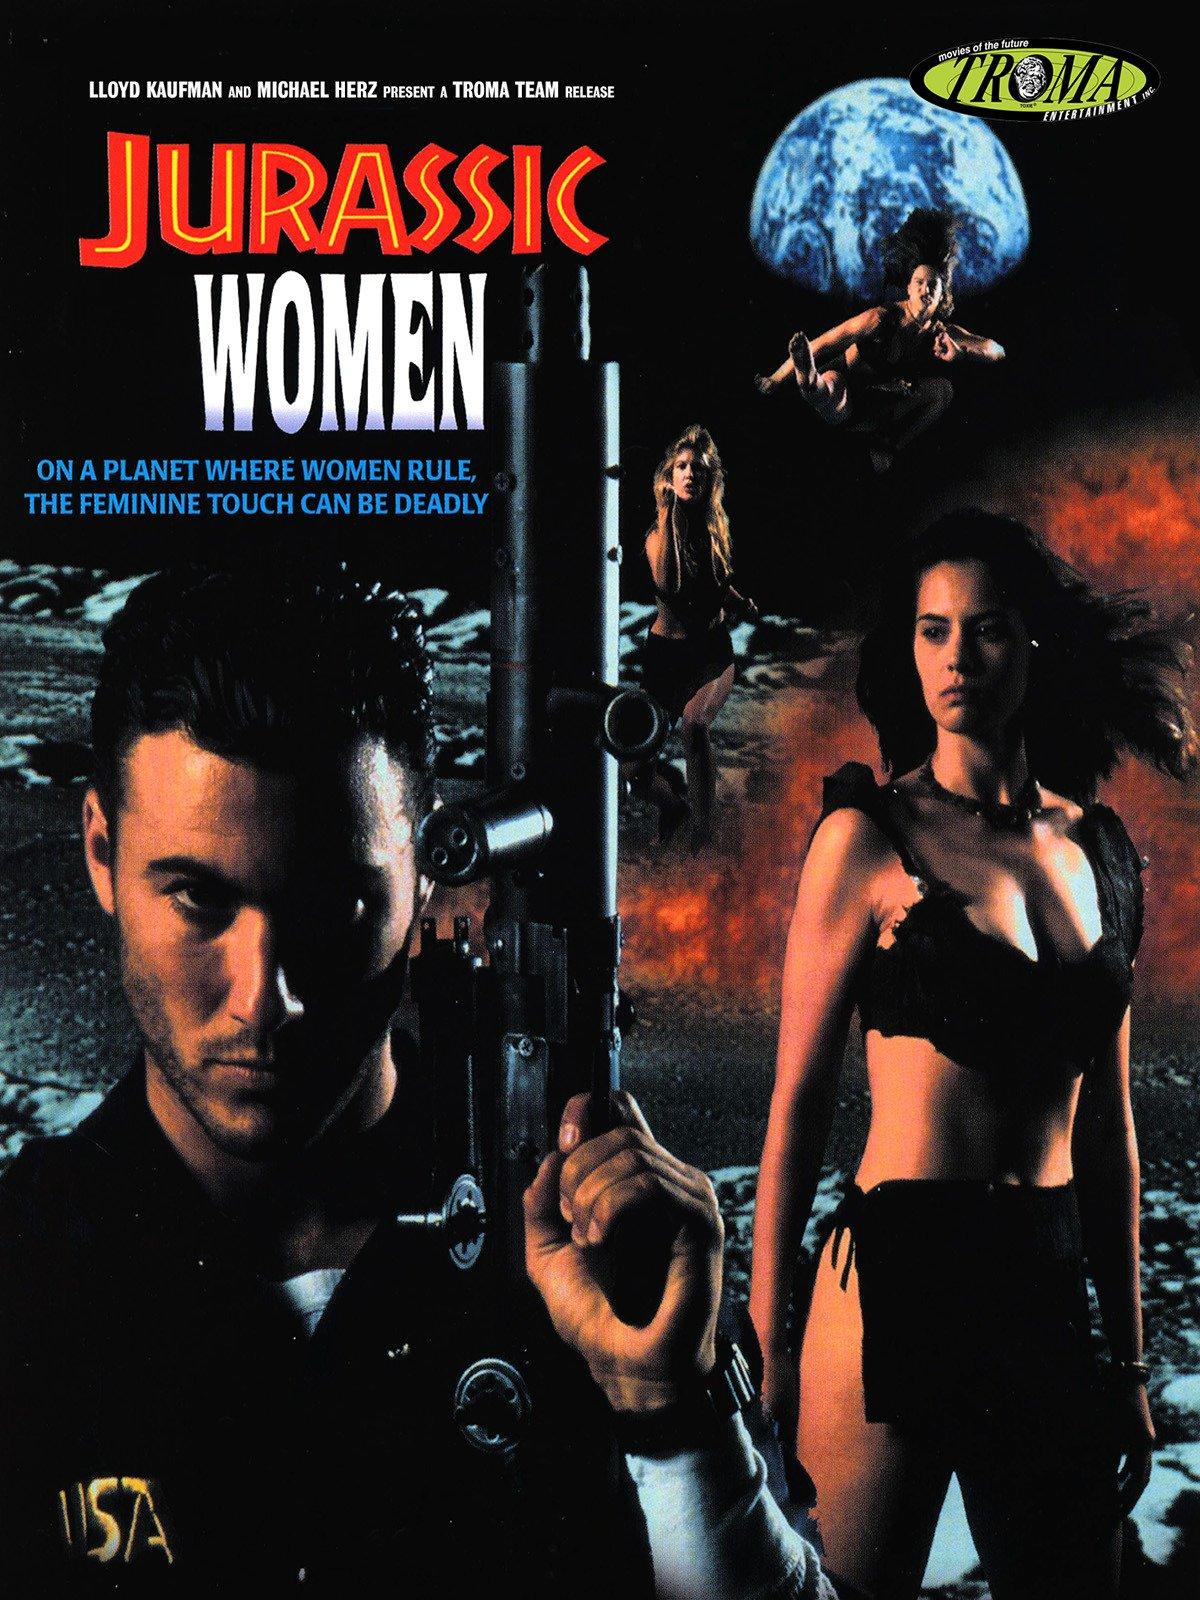 Jurassic Women